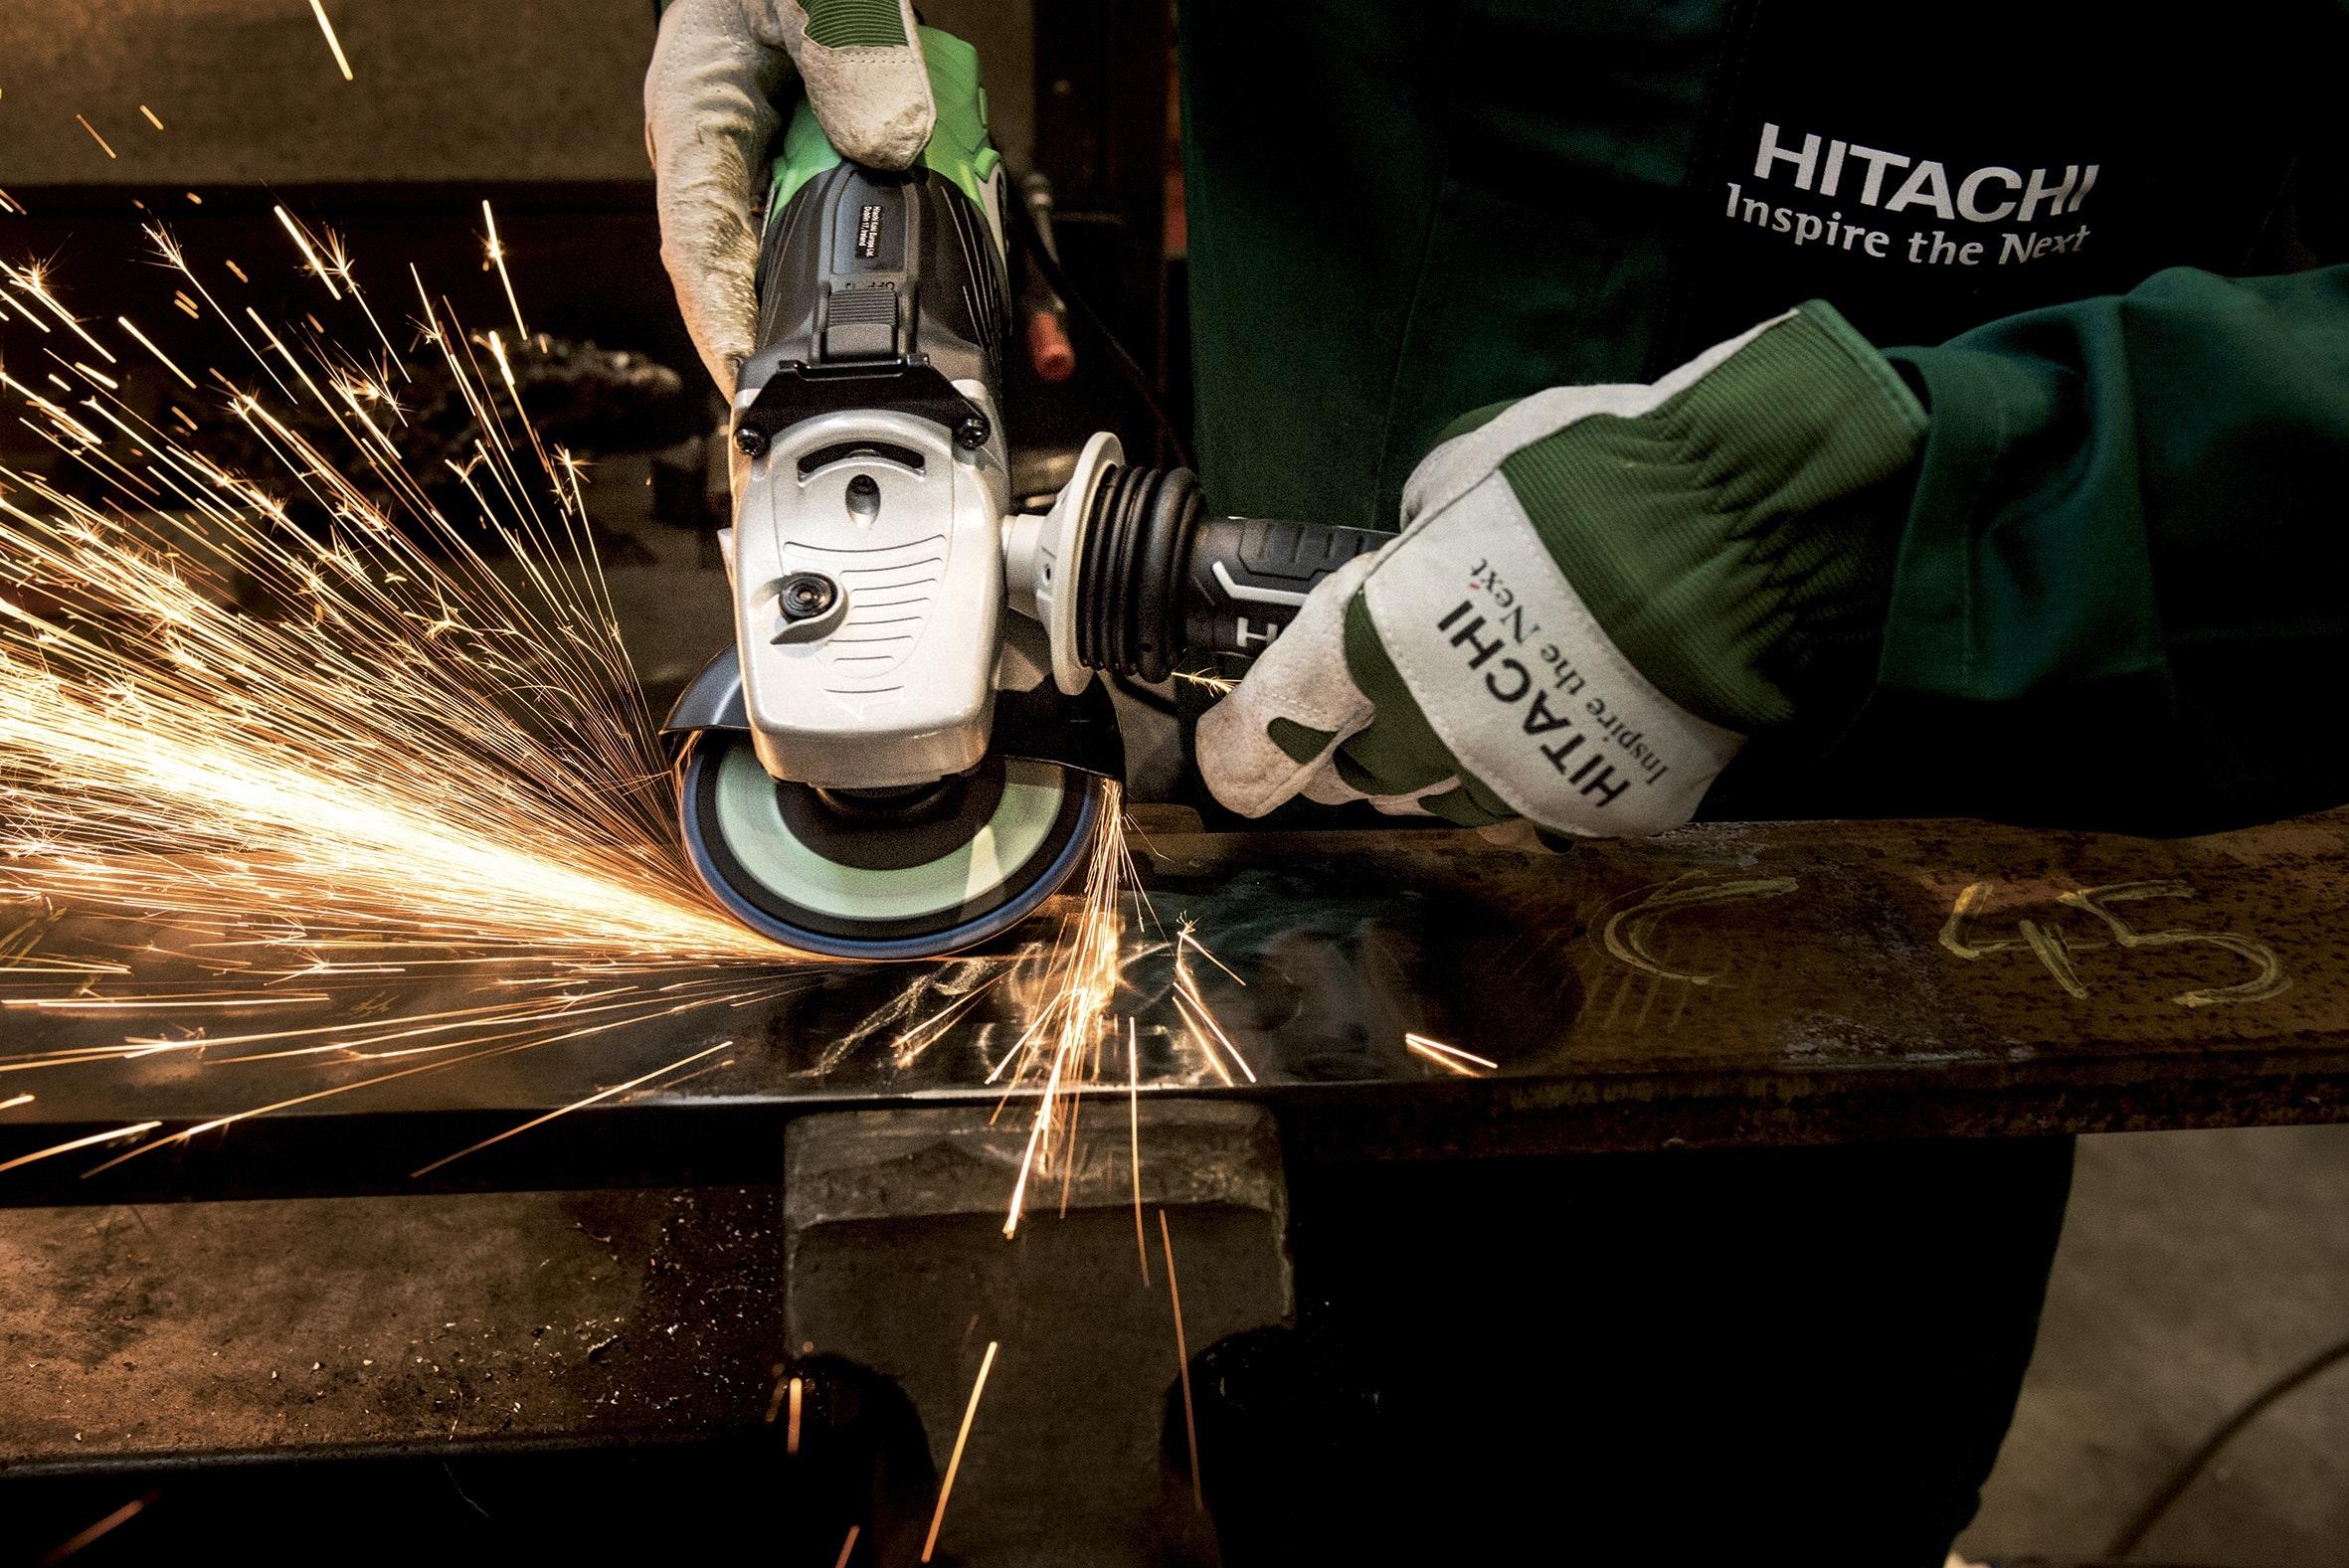 Hitachi White Black Angle Grinder, Flash, Power tool, Working, Technology, HQ Photo